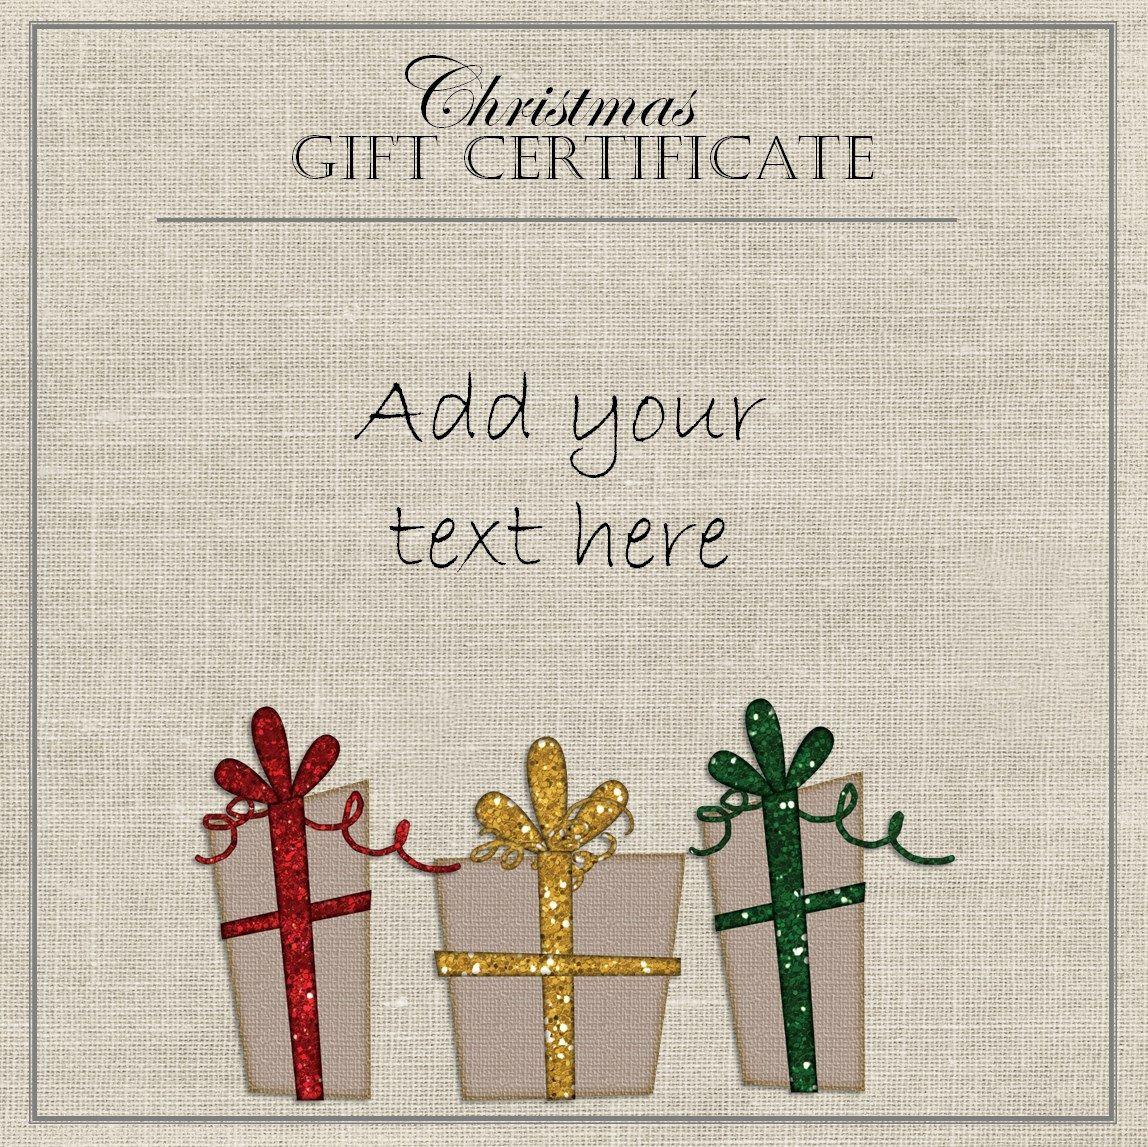 Christmas Gift Certificate Template 41 Jpg 1 148 1 147 Pixels Christmas Gift Certificate Template Christmas Gift Certificate Gift Certificate Template